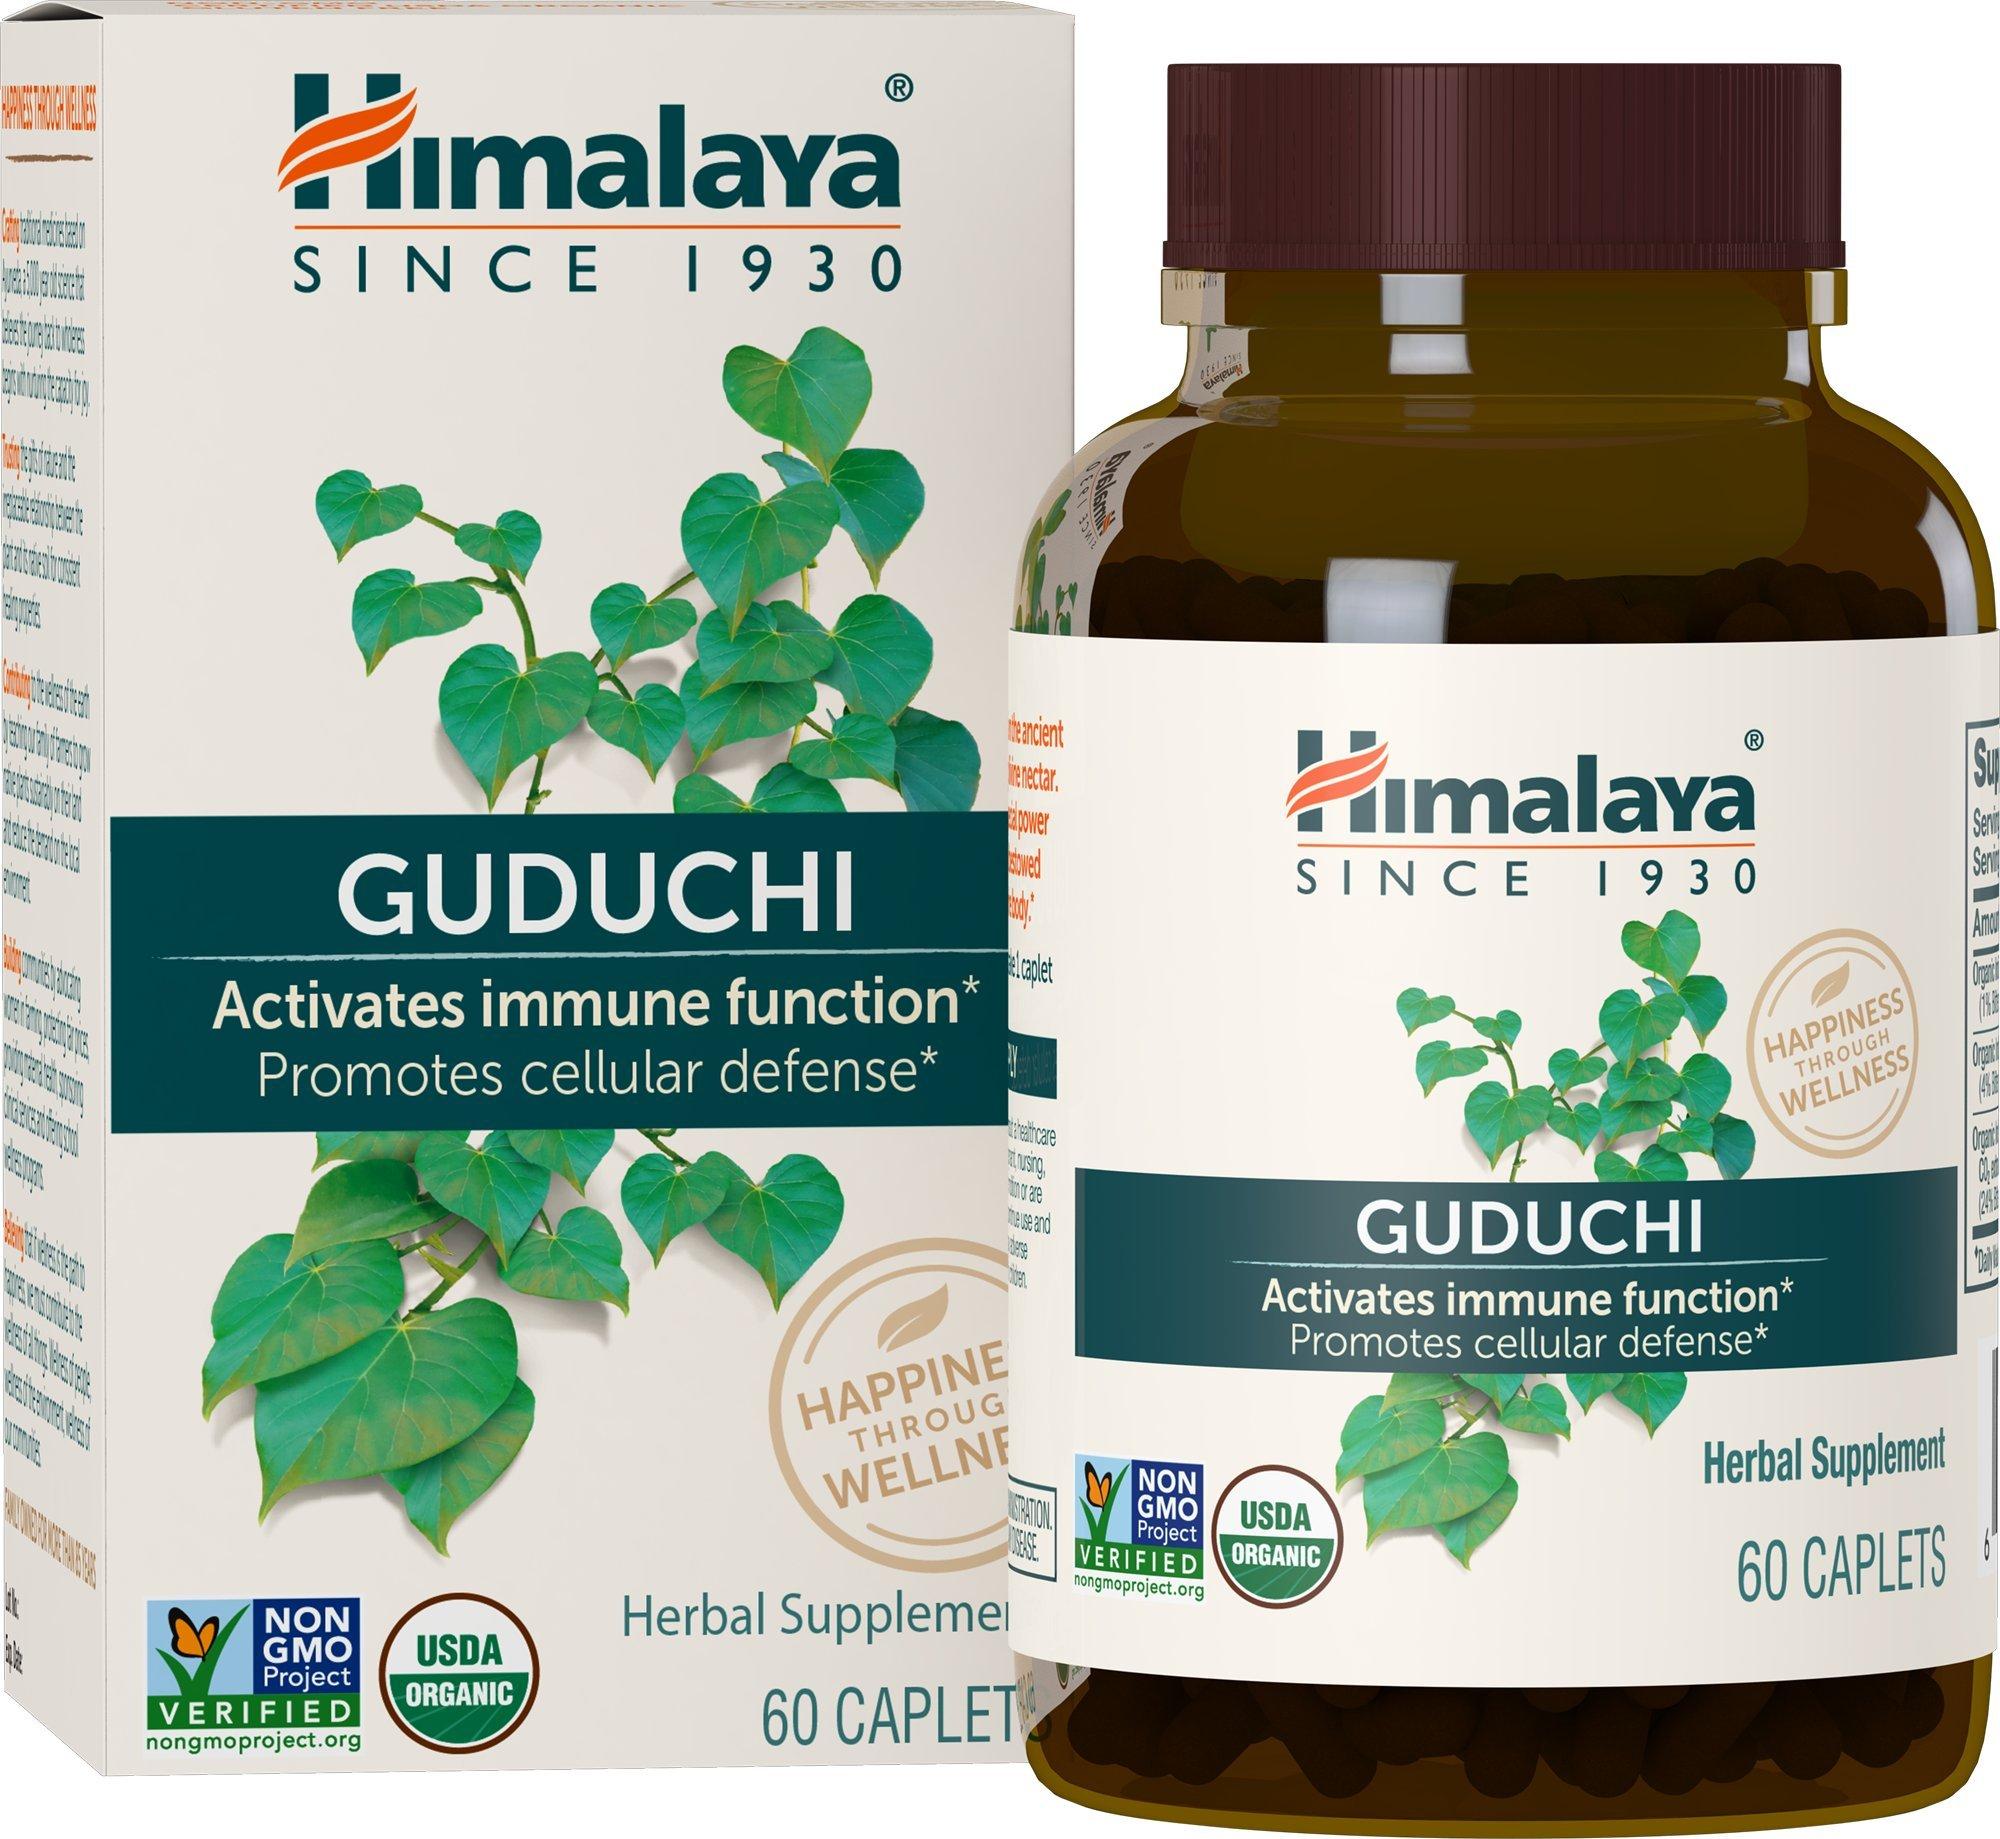 Himalaya Organic Guduchi 60 Caplets for Immune & Sinus Support 700mg, 1 Month Supply